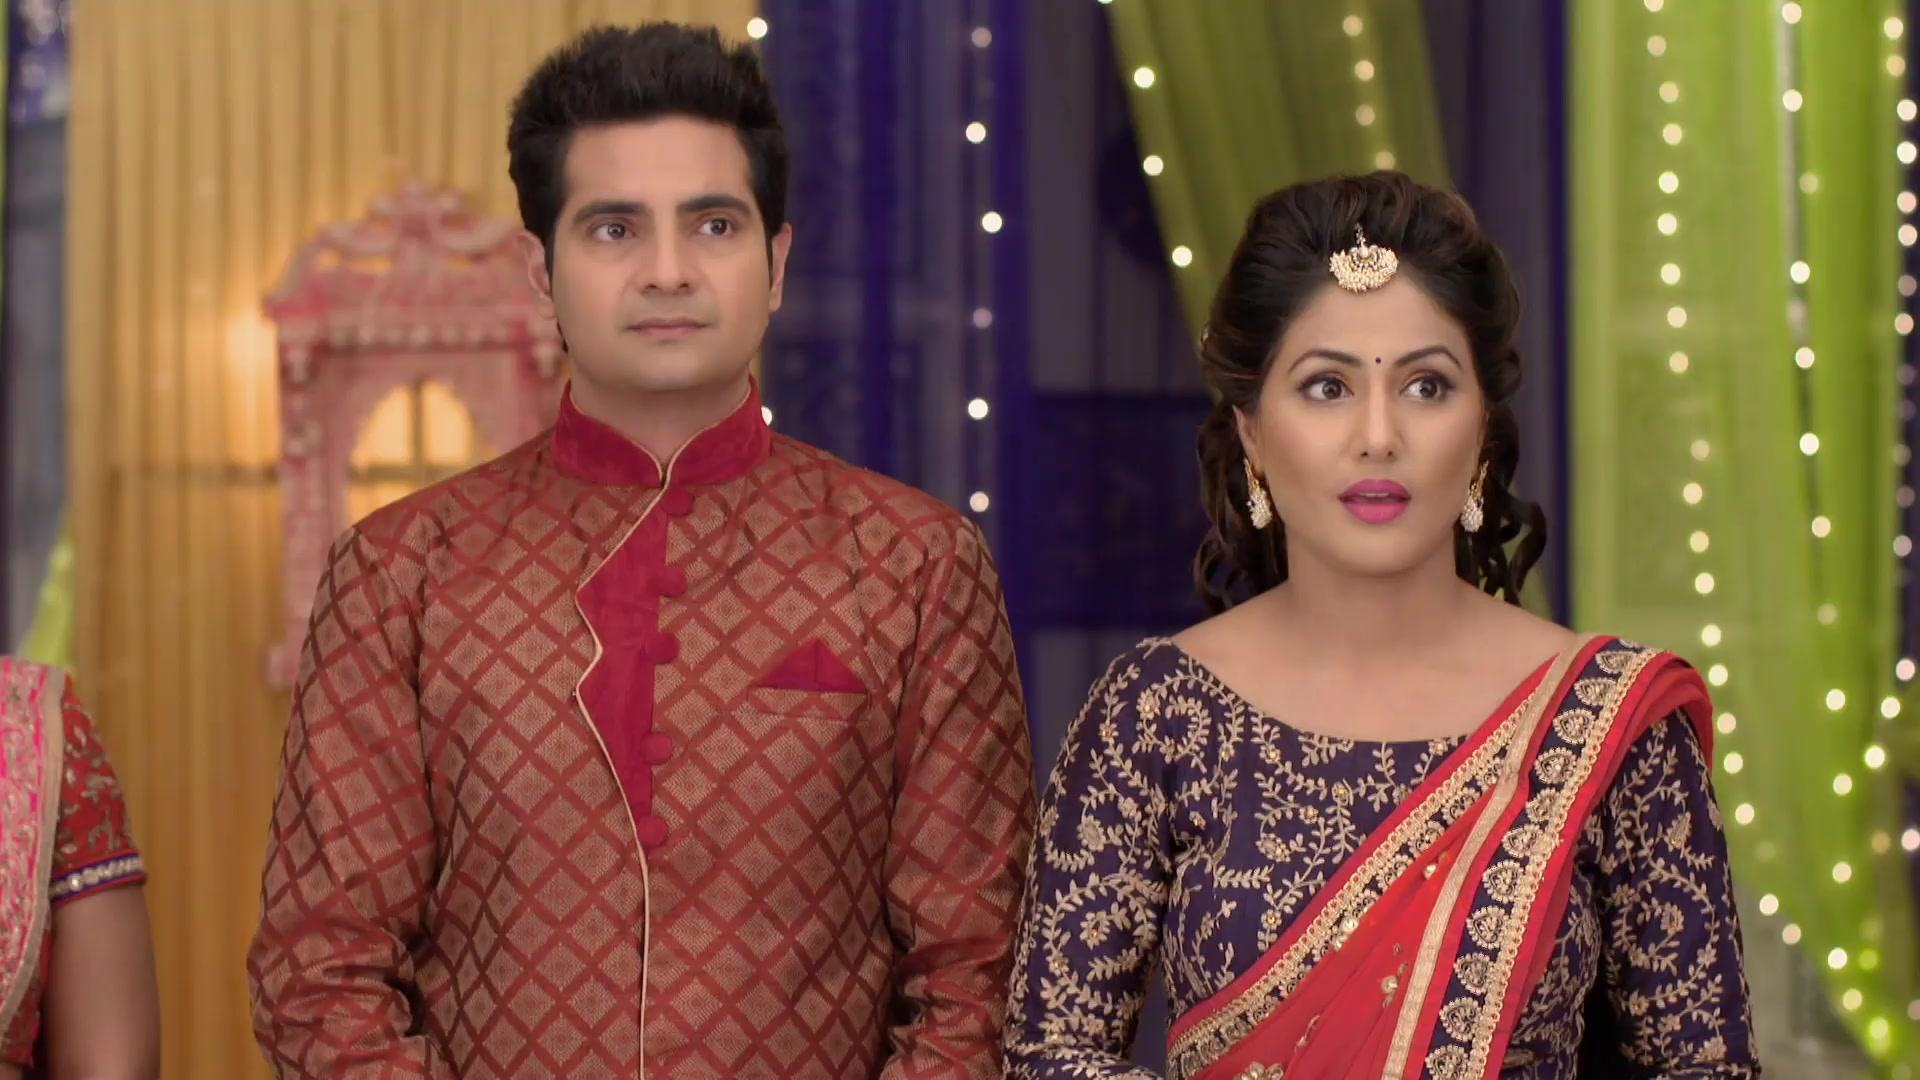 Karan Mehra Out! Guess who's in as Naitik in Yeh Rishta Kya Kehlata Hai!